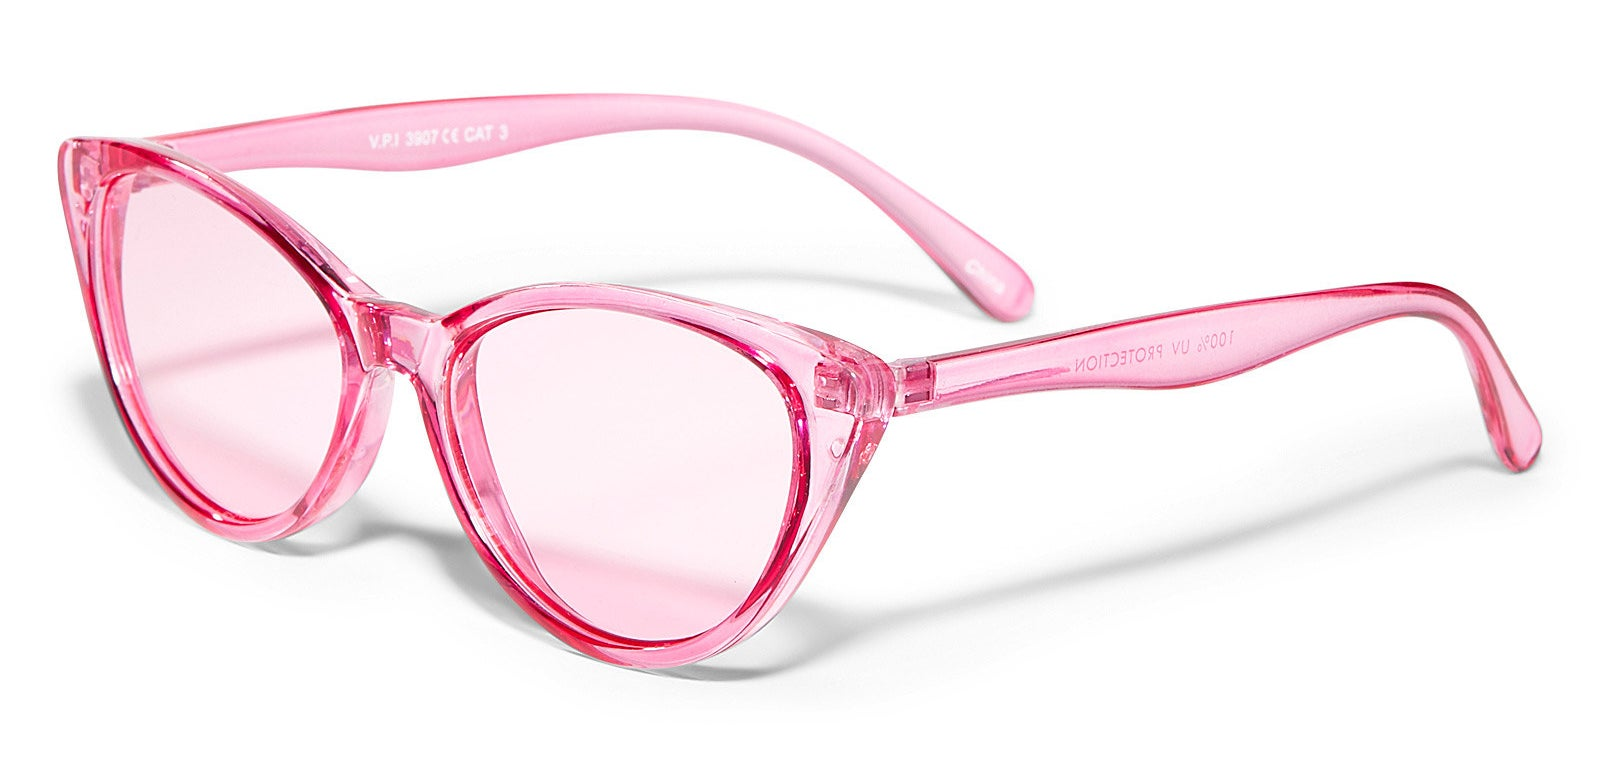 A pair of cat-eye shaped sunglasses